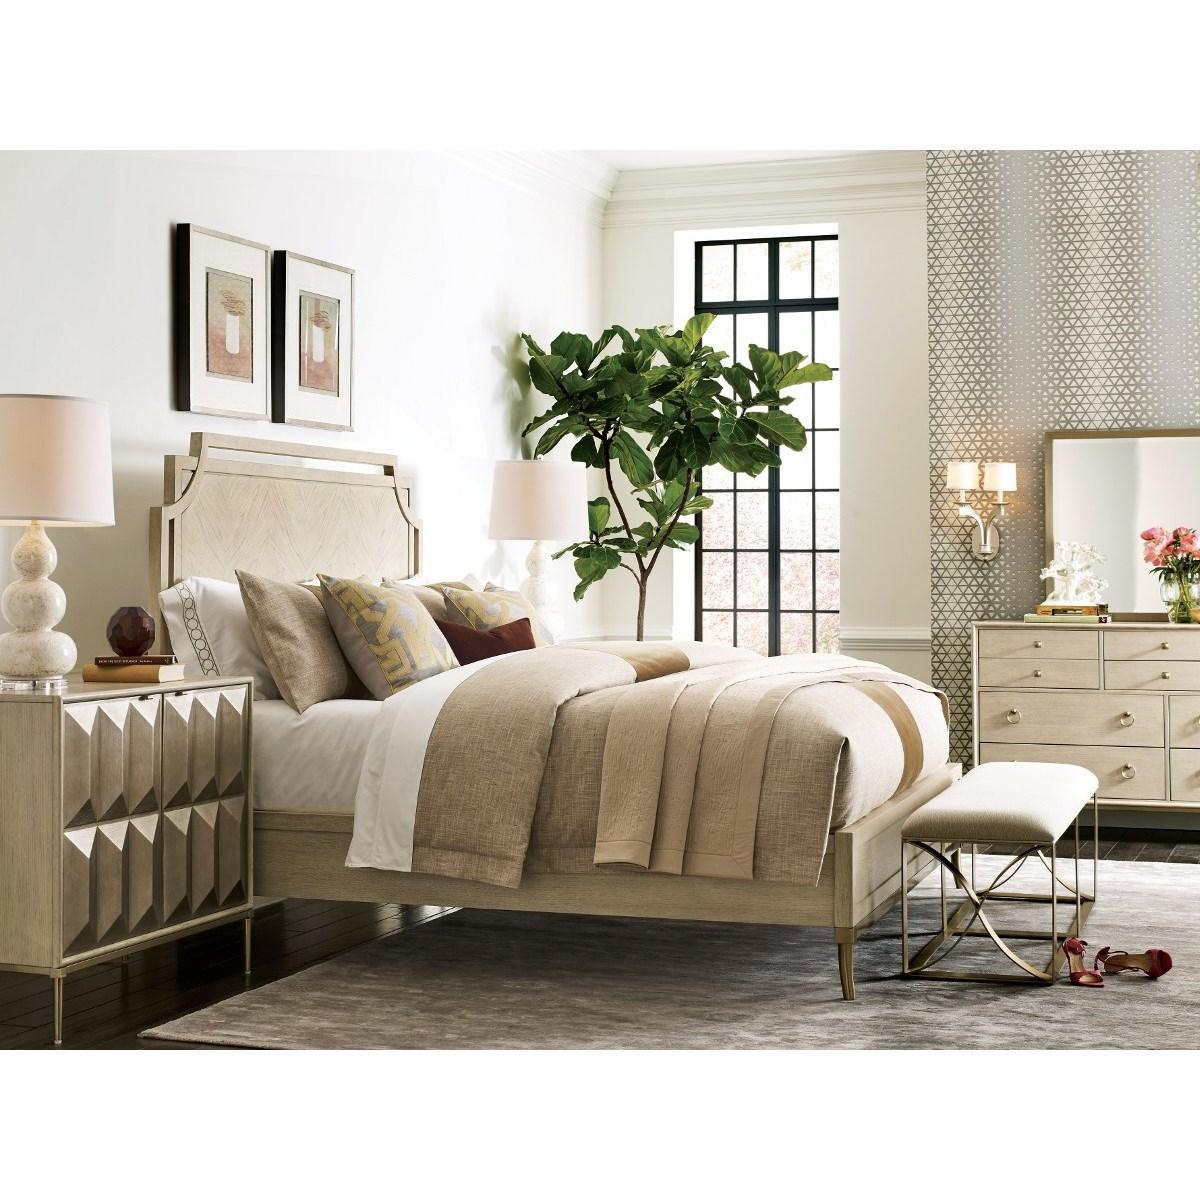 Lenox California King Bedroom Group by American Drew at Alison Craig Home Furnishings